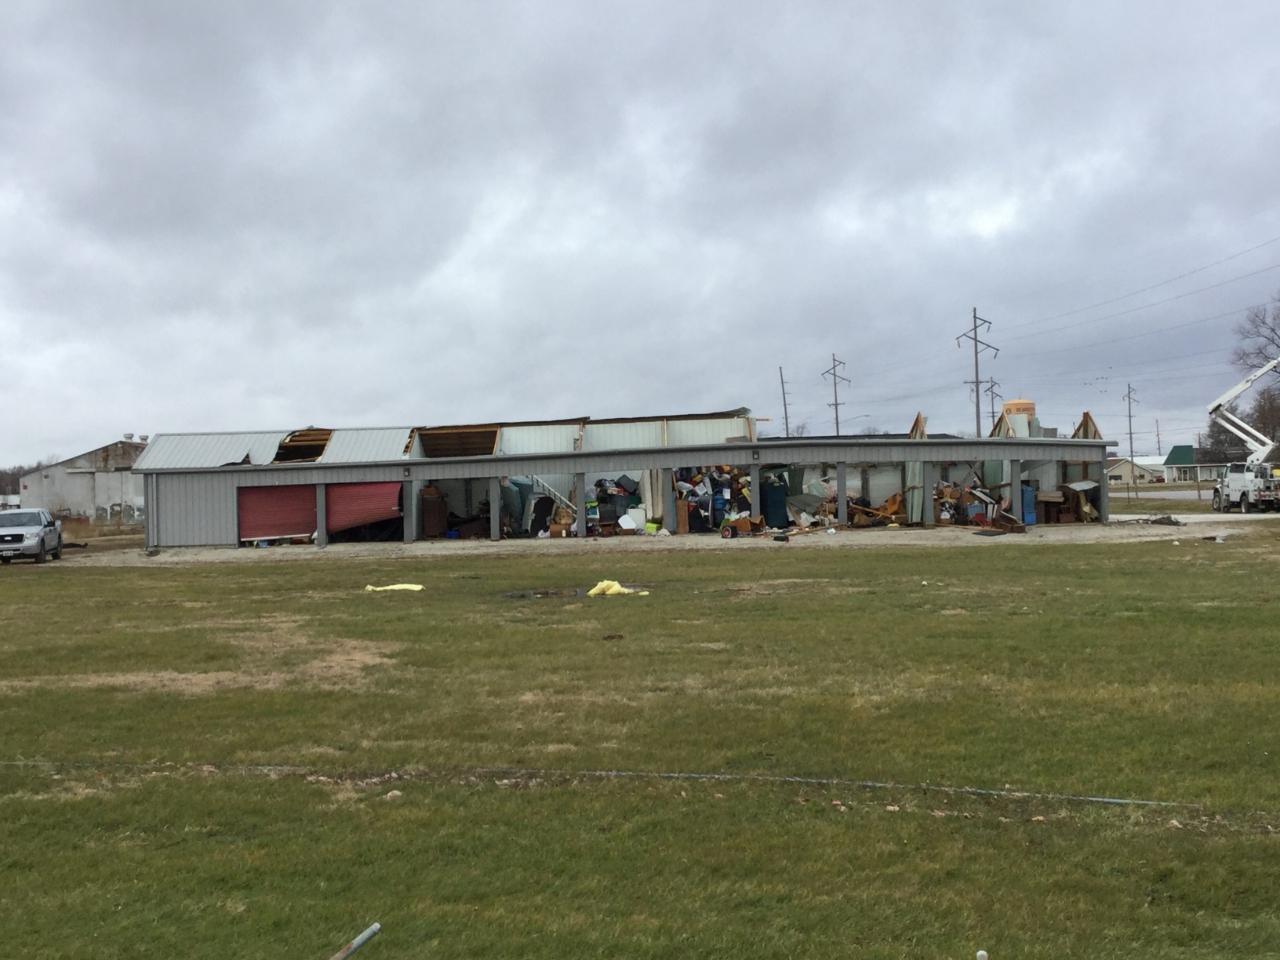 Building damage. NWS survey photo.